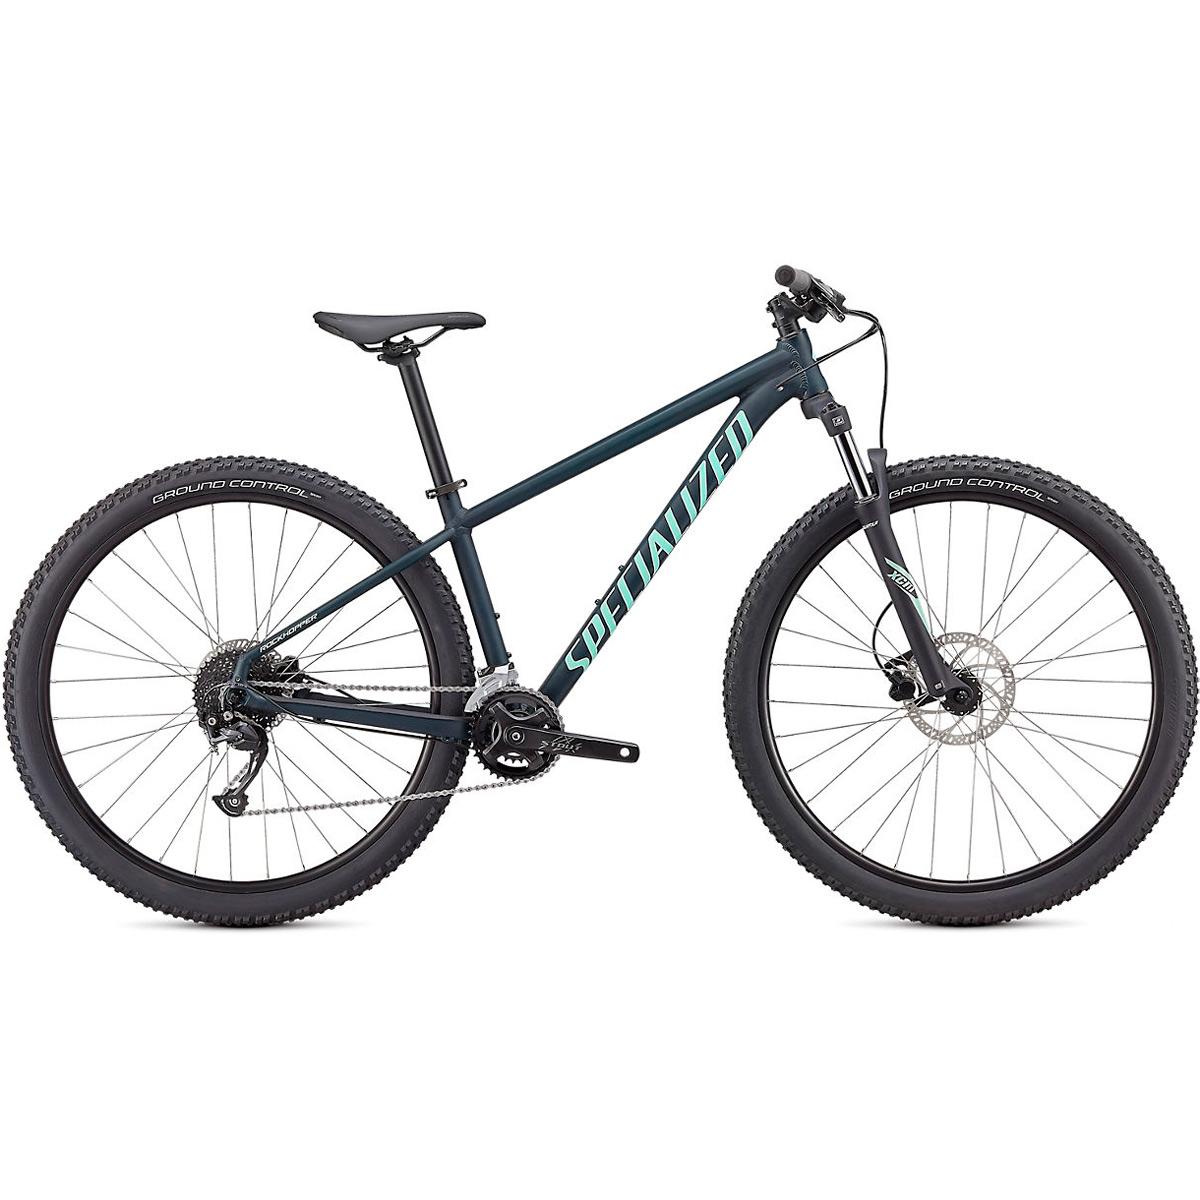 Bicicleta Specialized Rockhopper Sport 29 2021